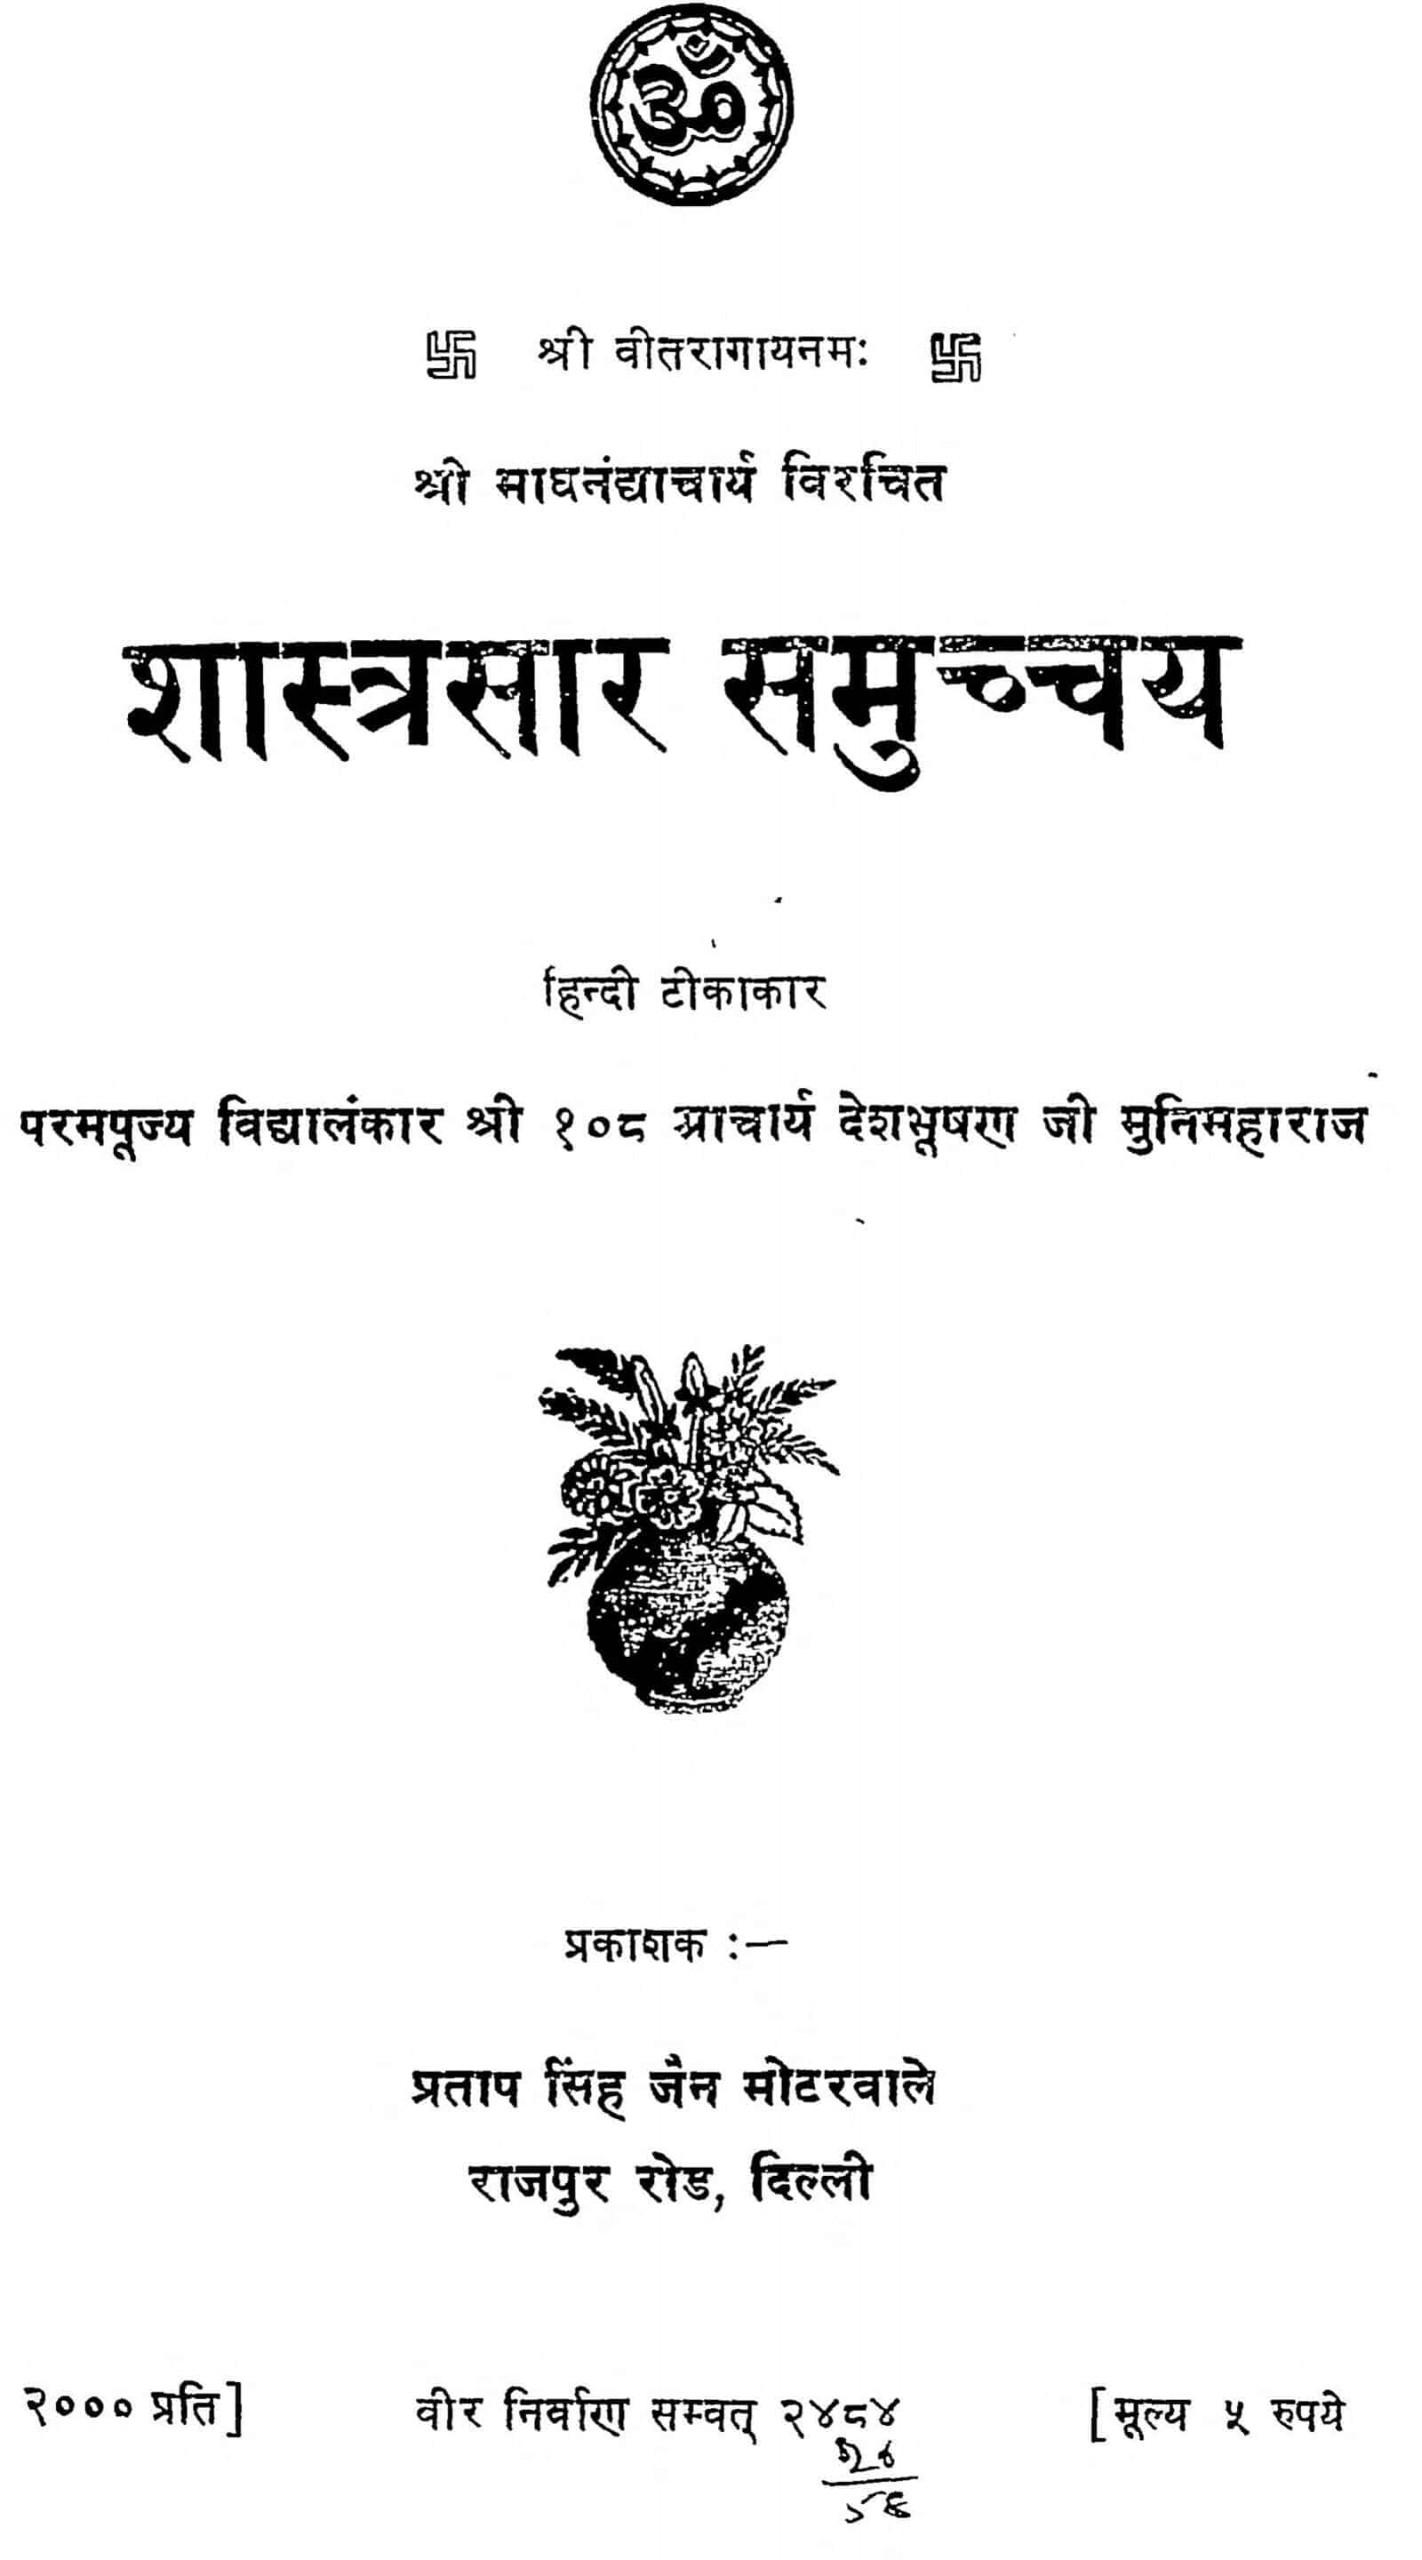 Book Image : शास्त्रसार समुच्चय  - Shastrasaar Samuchchay